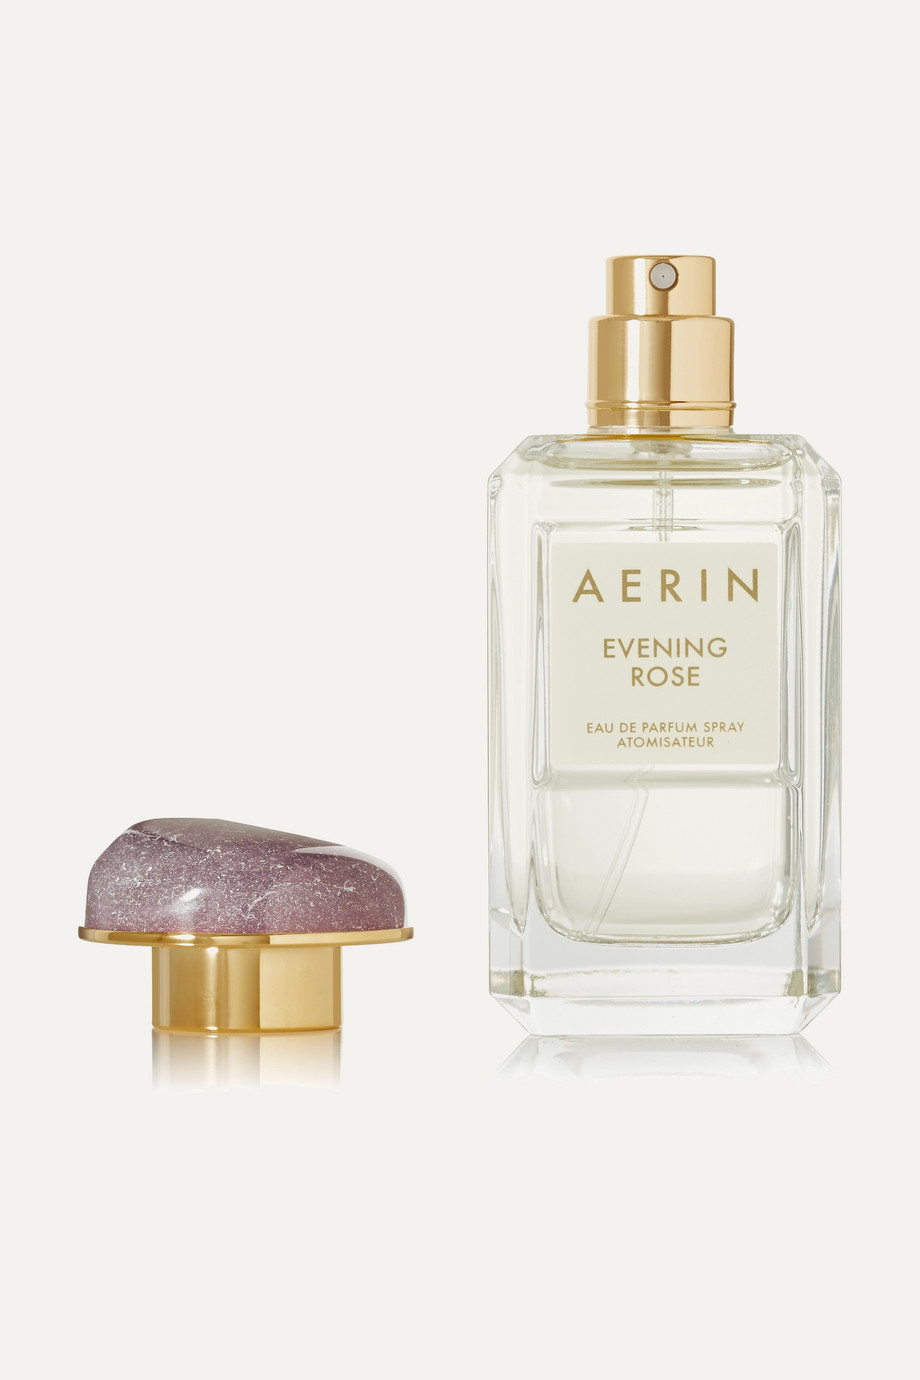 AERIN Beauty Evening Rose – Provence-Rose & Cognac, 50 ml – Eau de Parfum